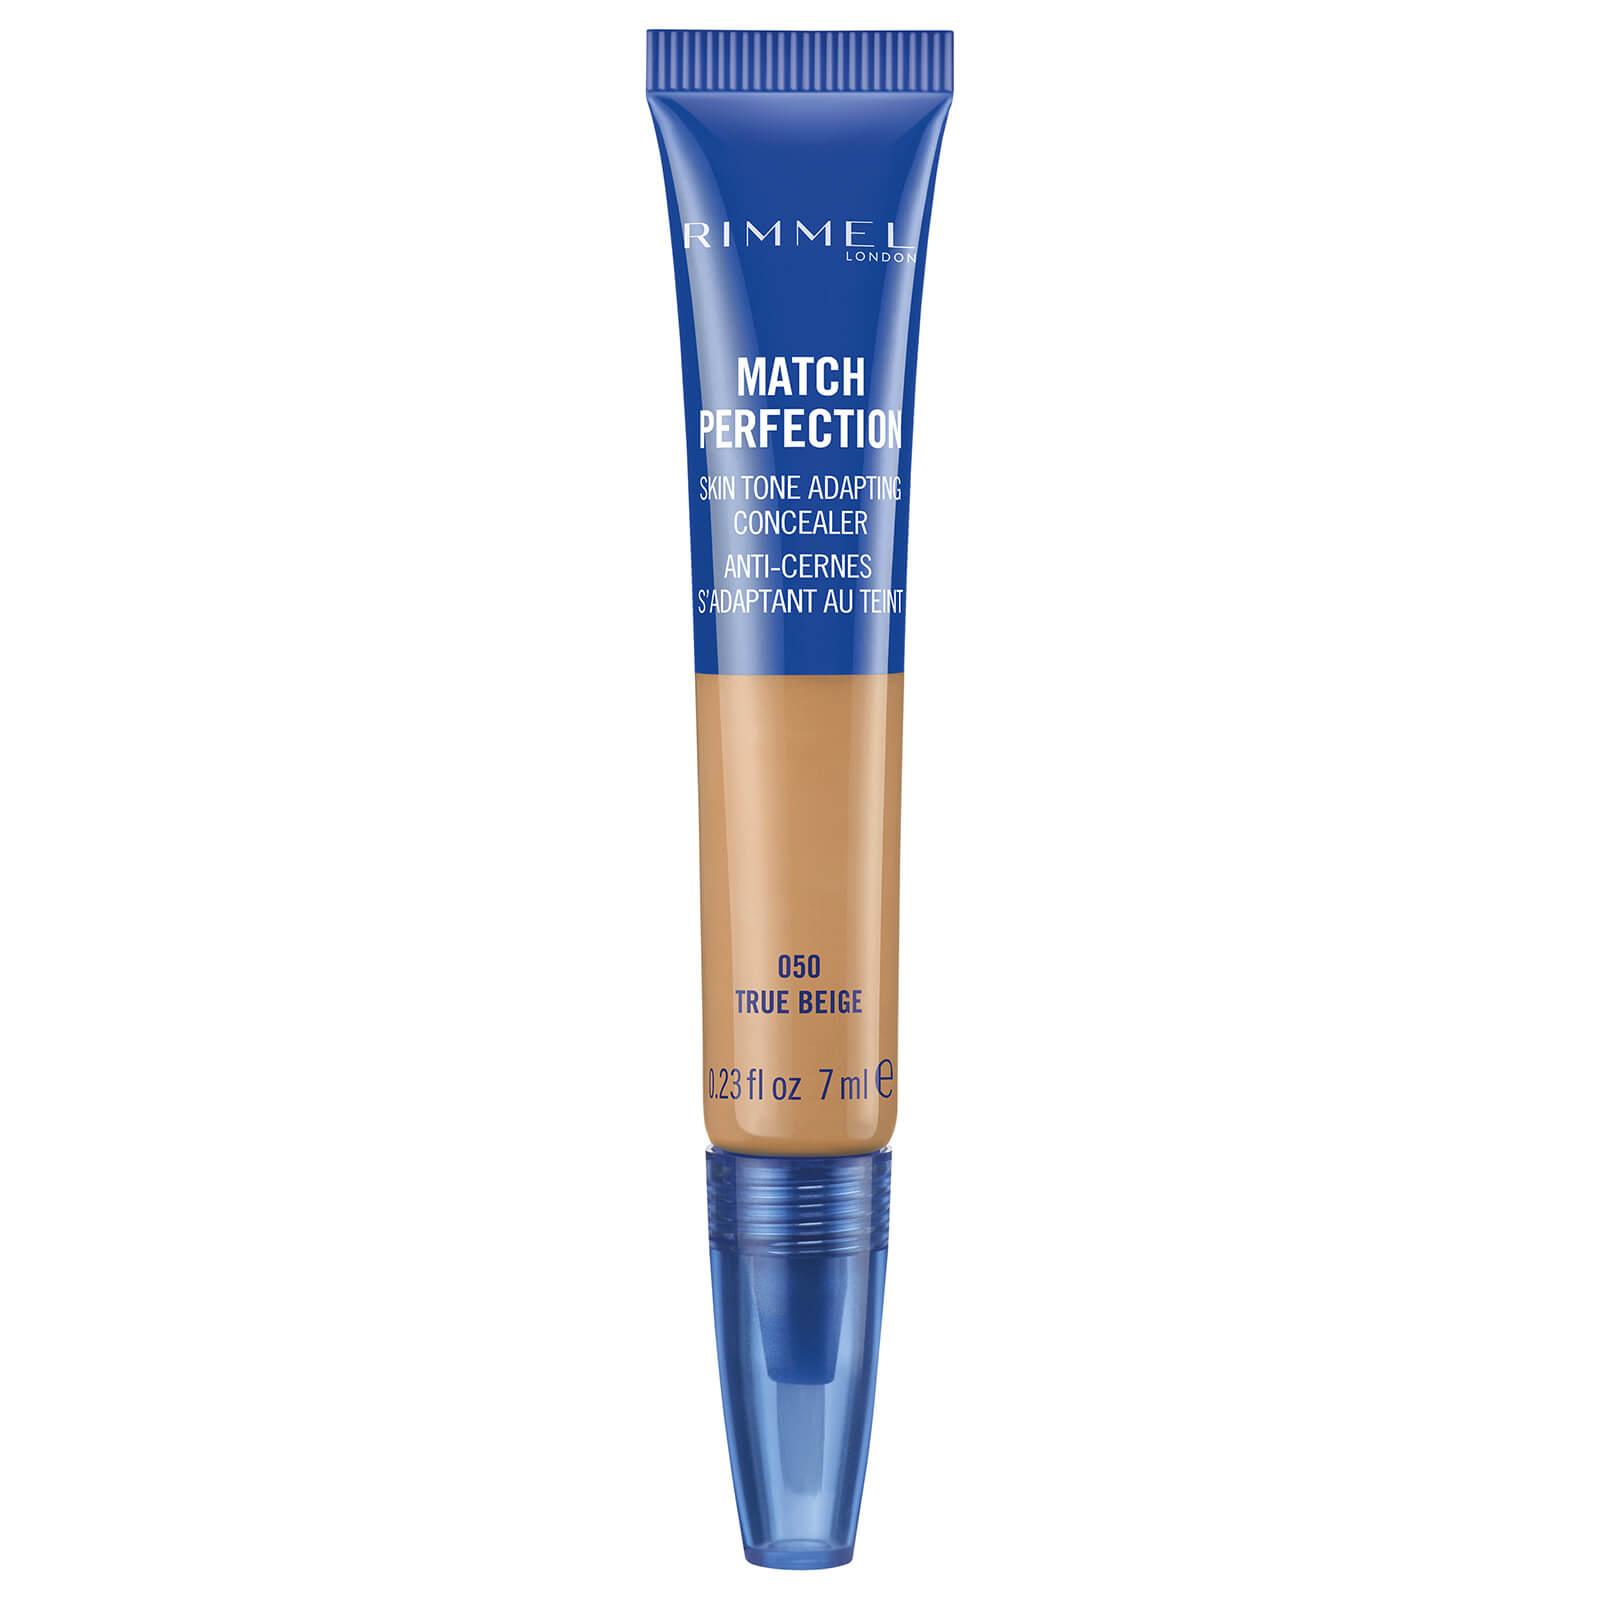 rimmel match perfection concealer 7ml (various shades) - true beige